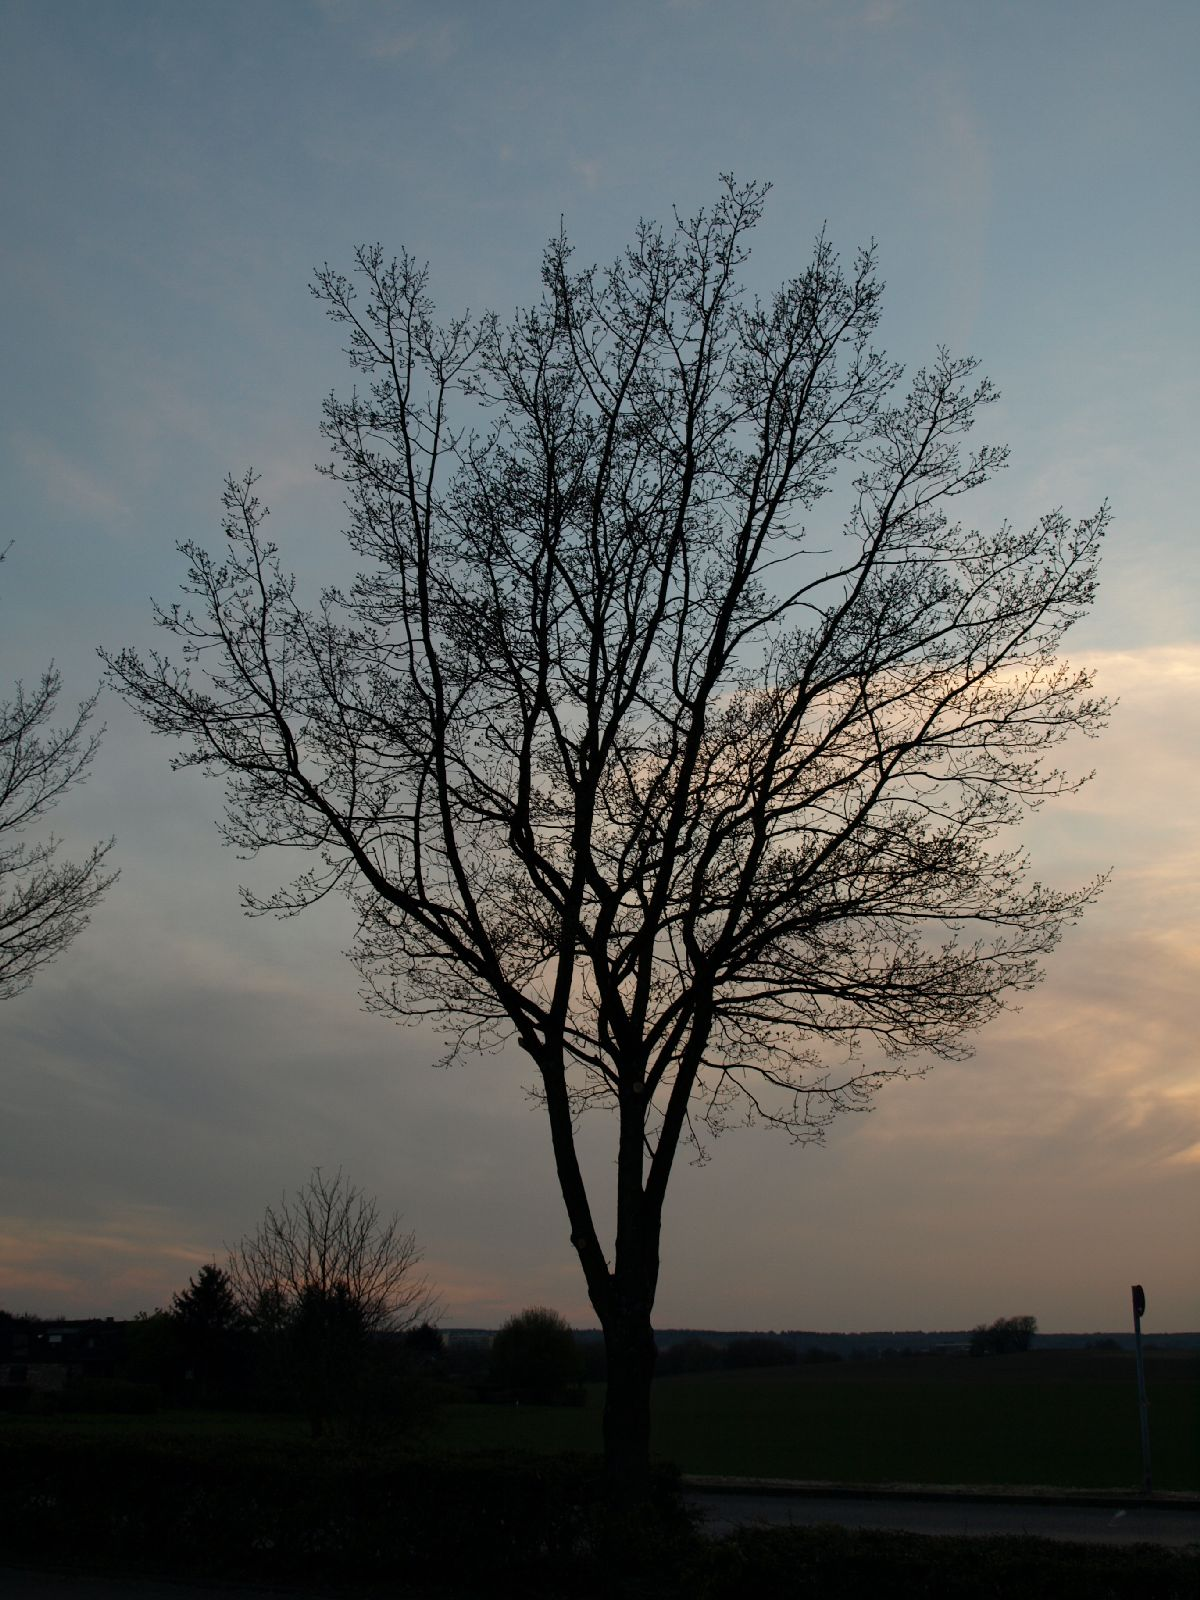 Pflanzen-Baum-Silhouette-Foto_Textur_B_P4171378